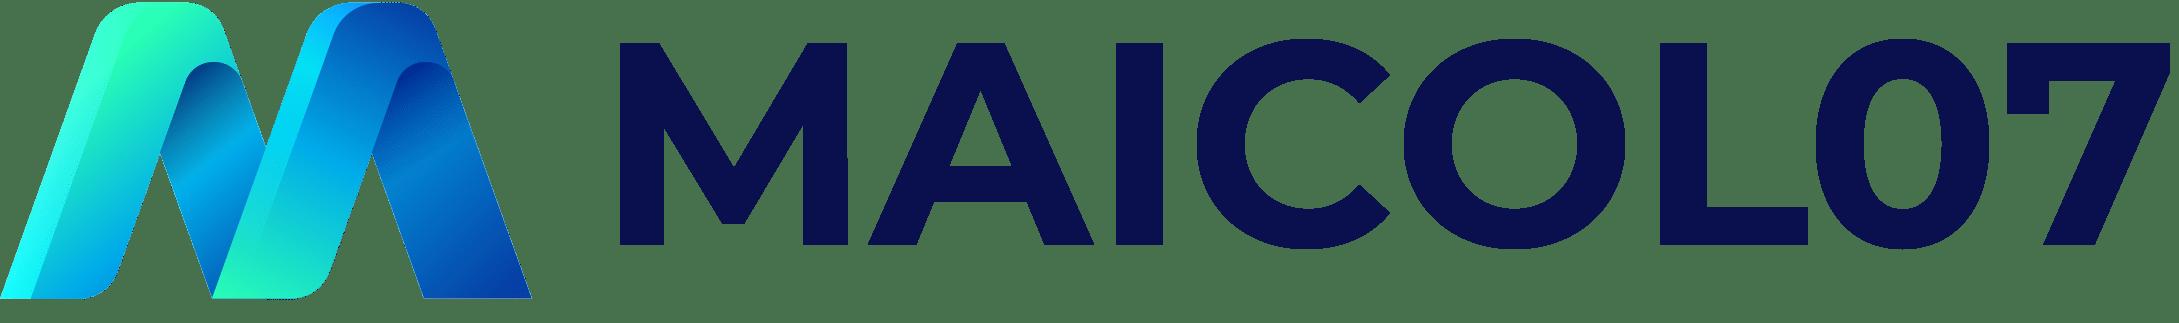 Maicol07 Blog